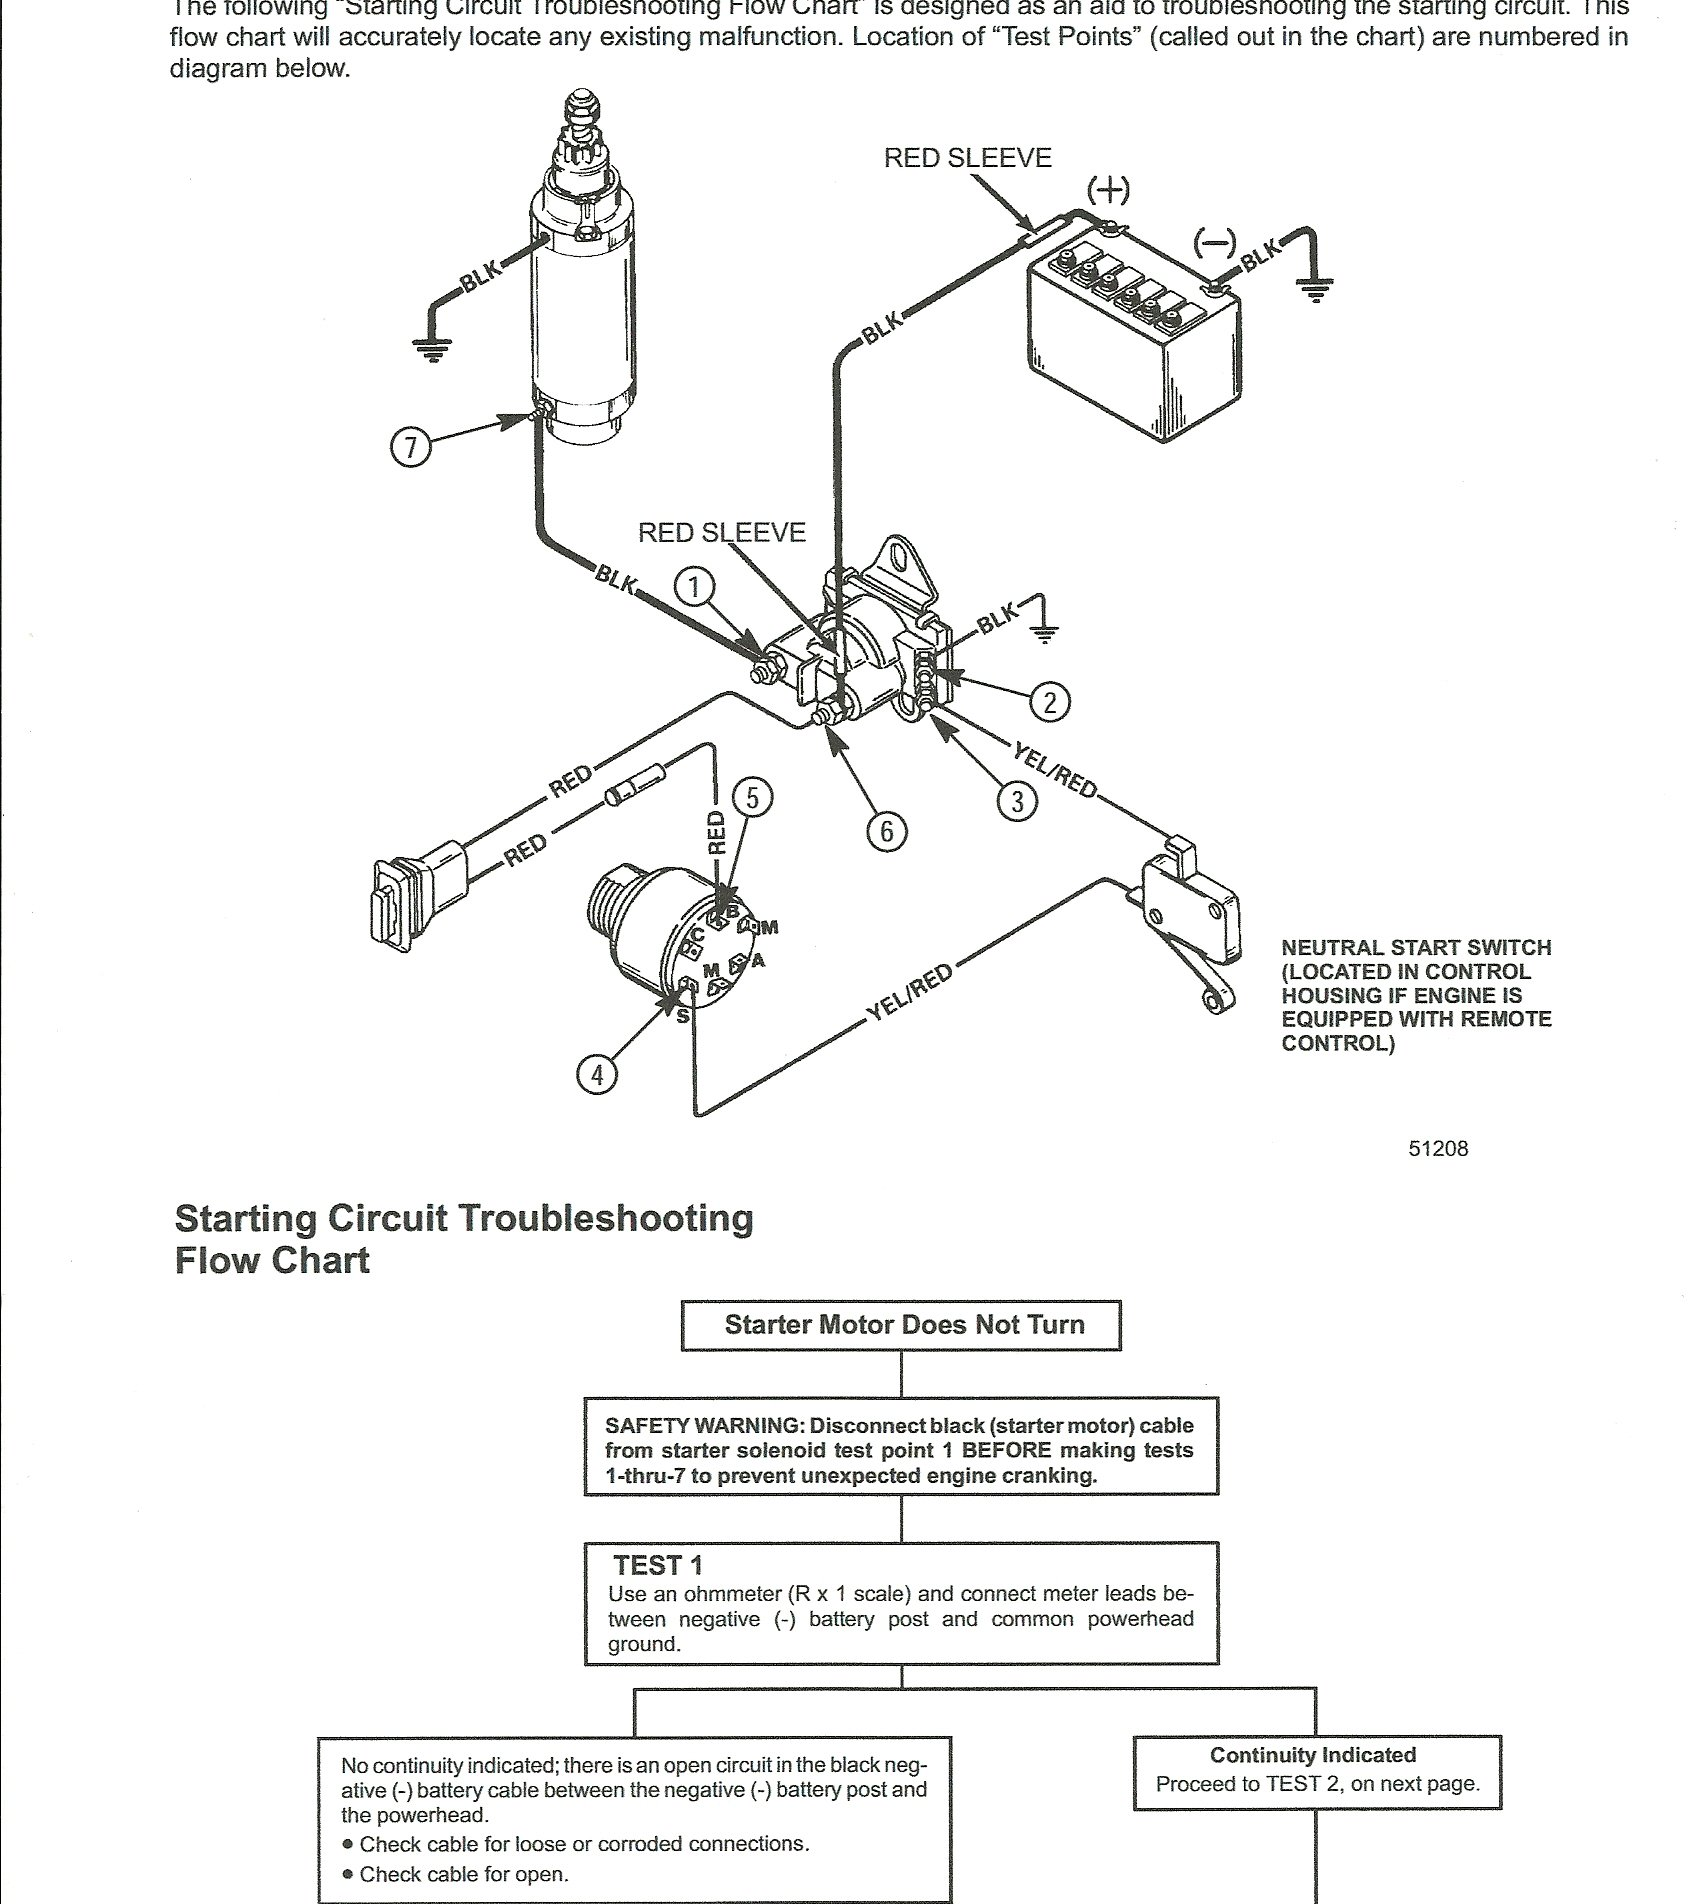 Mb 8301 Mercury 40 Hp Outboard Motor Wiring Diagram Additionally Mercury Free Diagram